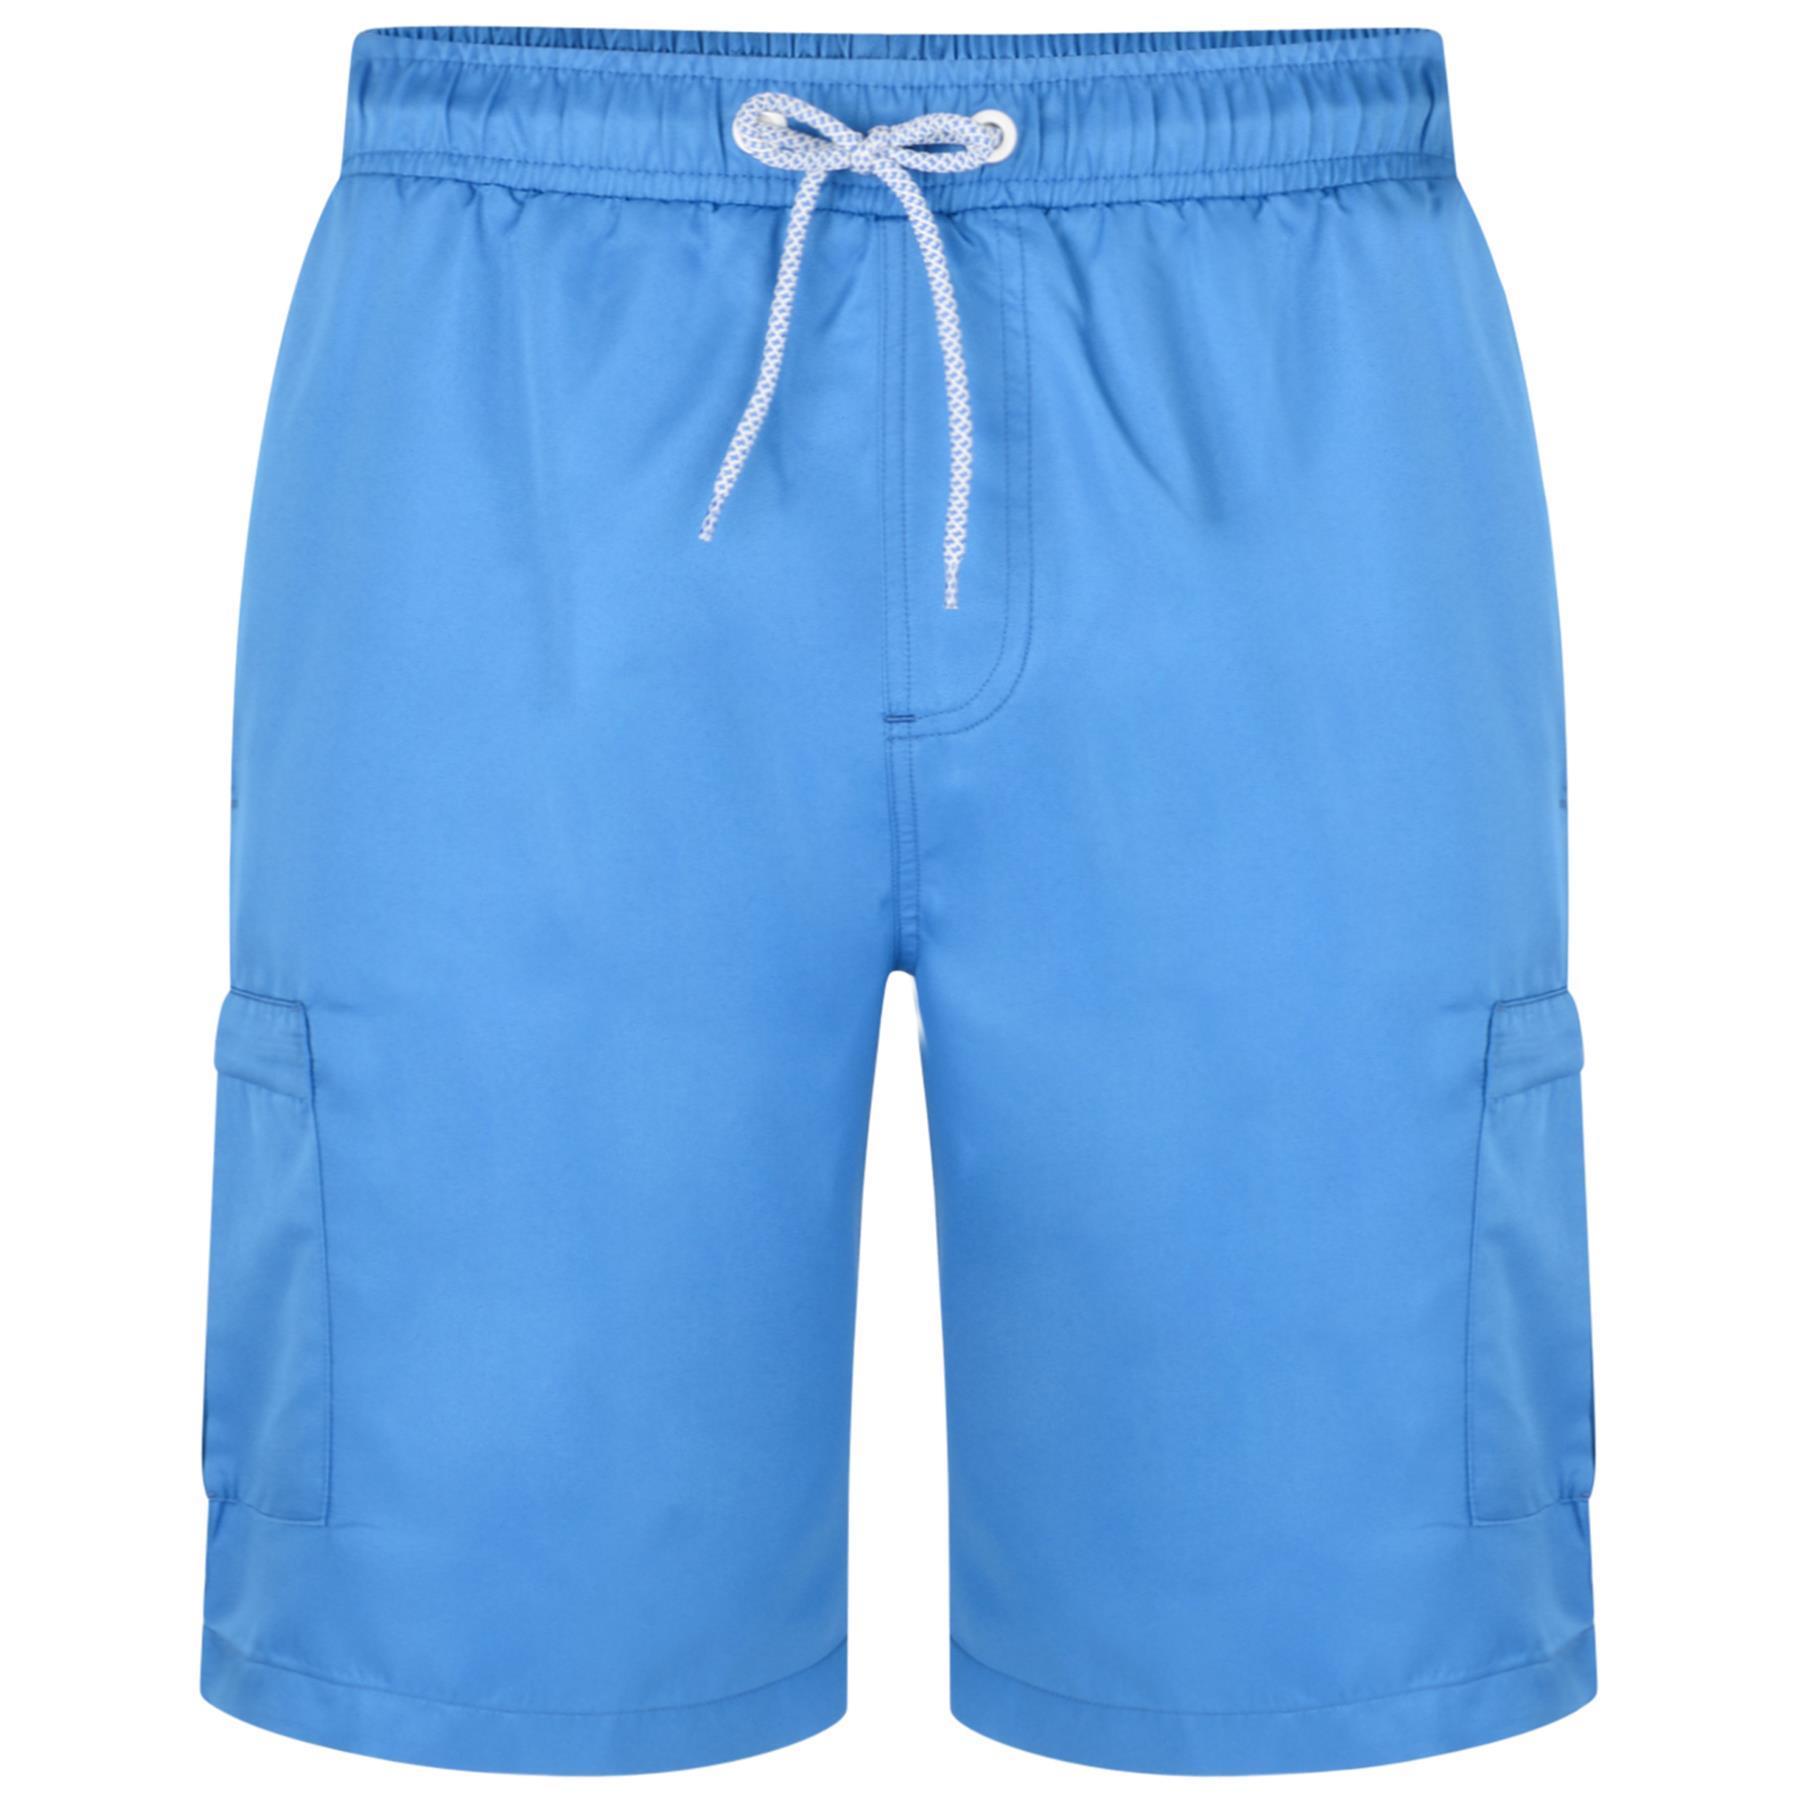 KAM Mens Big Size Plain Cargo Swim Shorts 334 in Size 2XL to 8XL